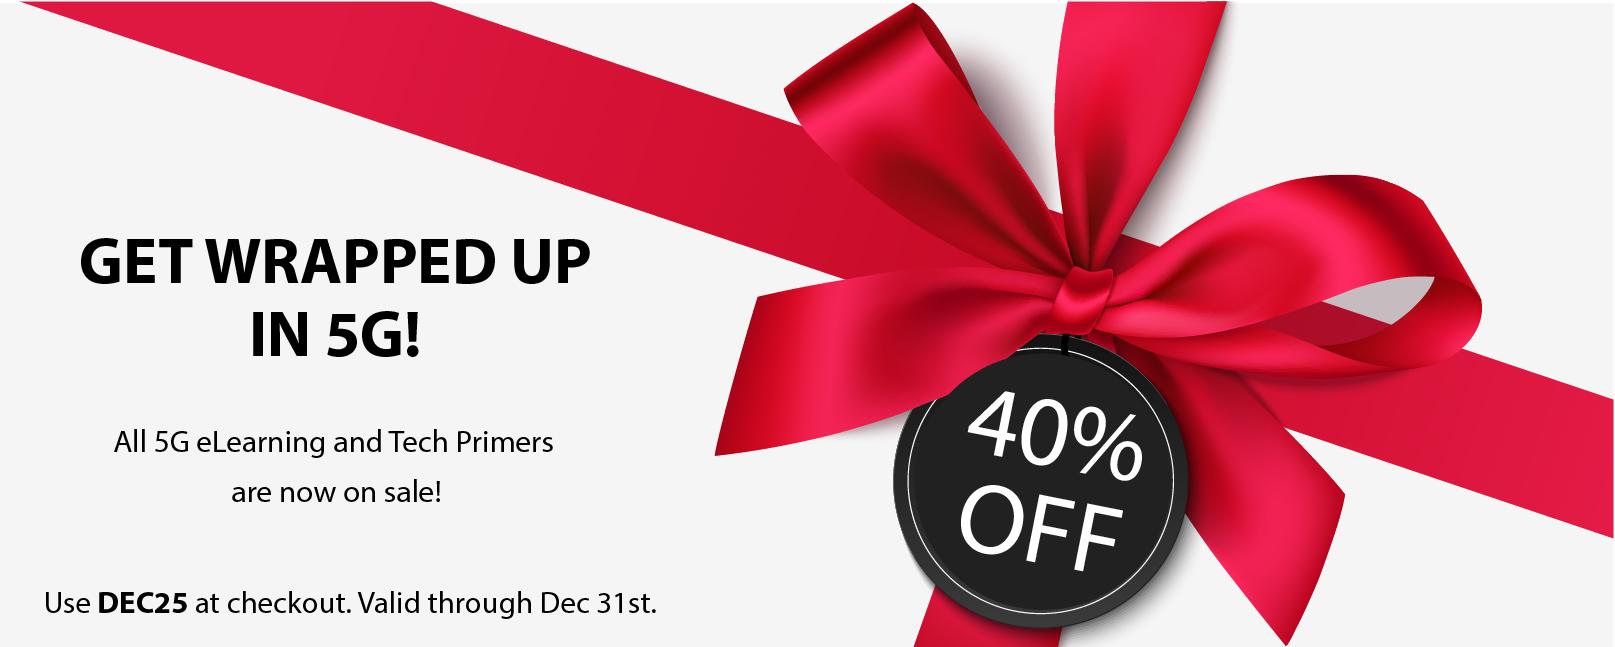 December 5G Sales website 775 x 310-01.jpg